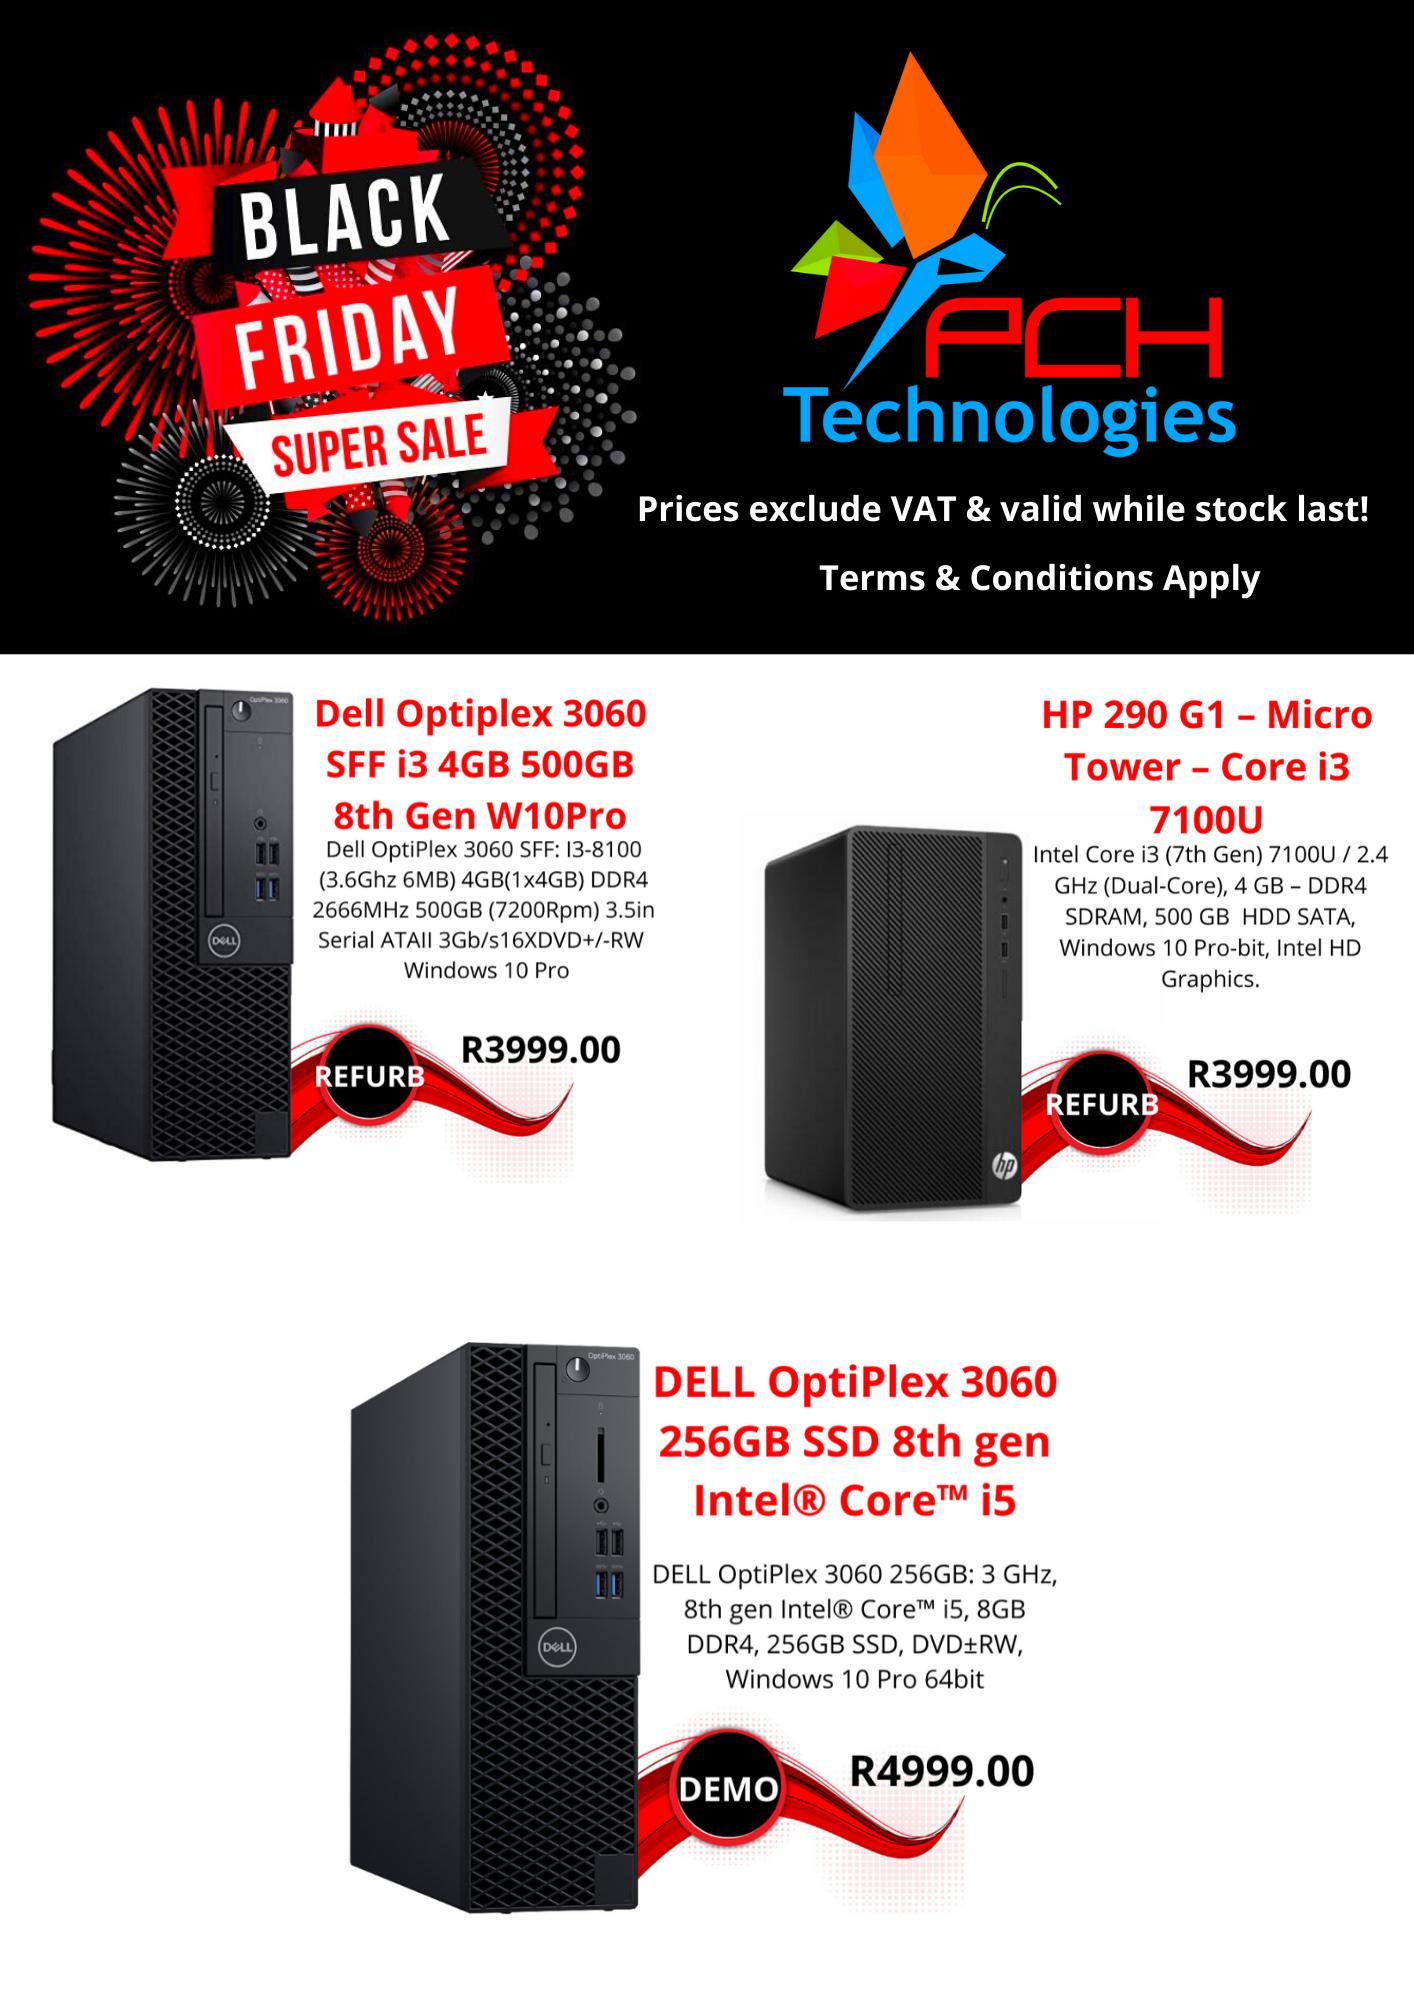 BLACK FRIDAY DESKTOP PC SALE!!